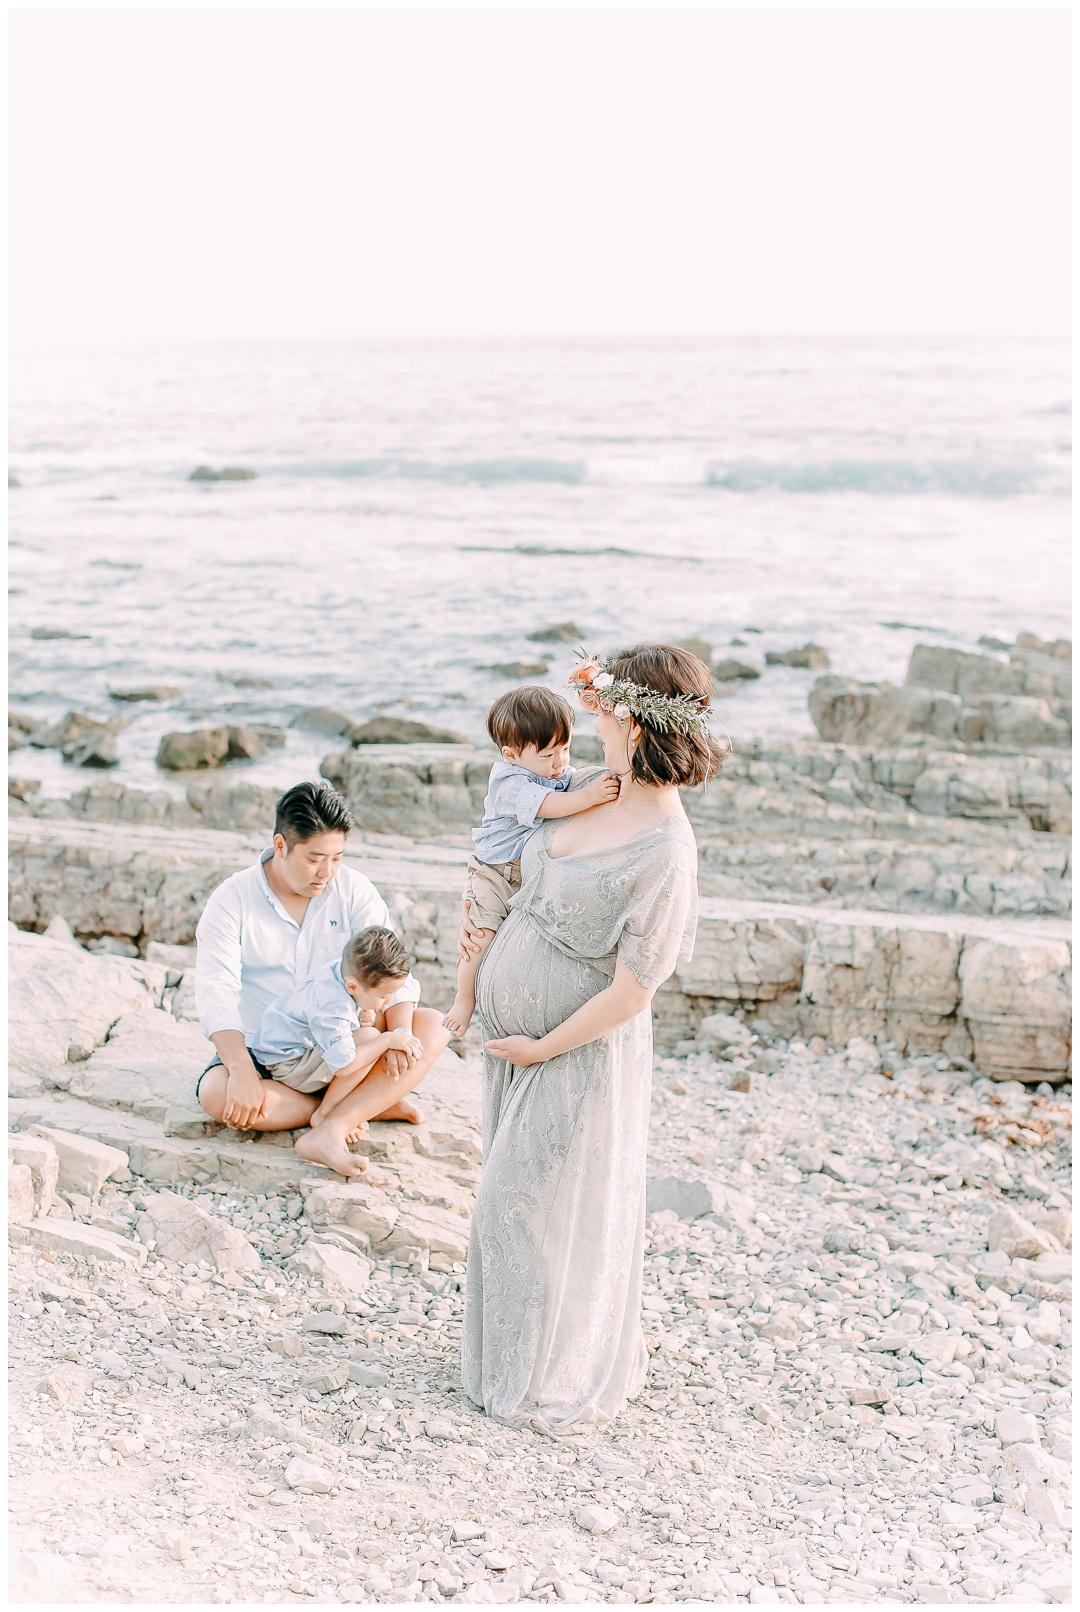 Newport_Beach_Maternity_Photographer_Orange_County_Maternity_Photography_Cori_Kleckner_Photography_Orange_County_Family_Photographer_Beach_Maternity_Session_1114.jpg